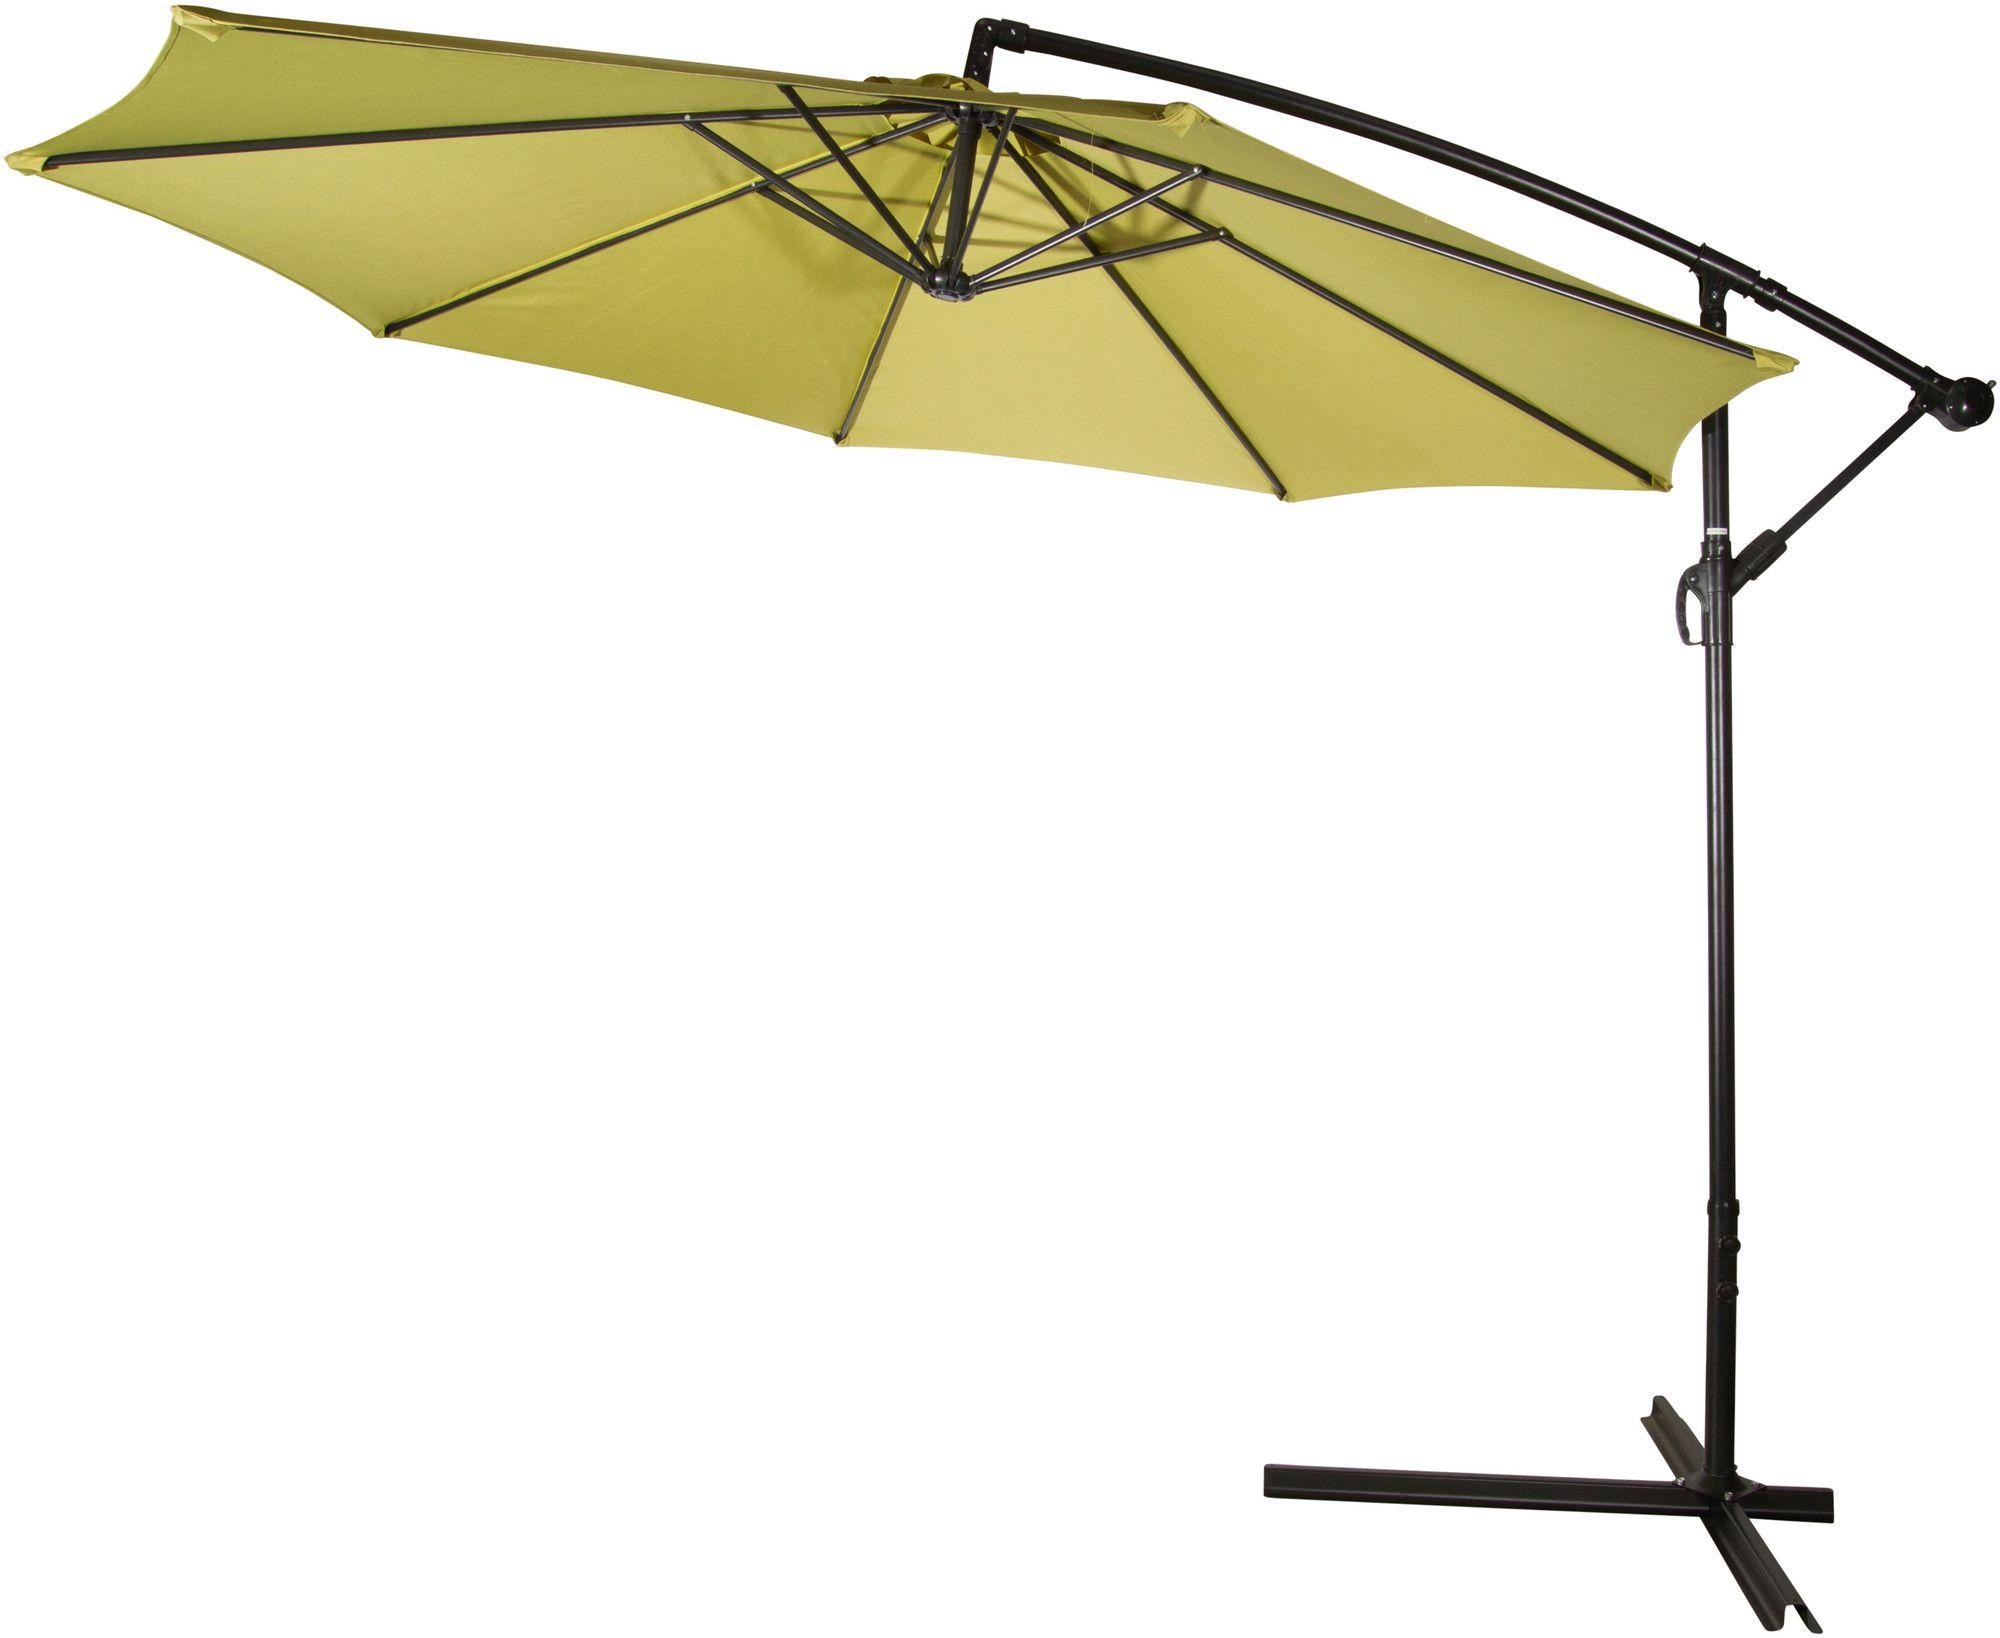 Kinsey Patio Umbrella   Joss & Main   New house   Pinterest   Patio ...